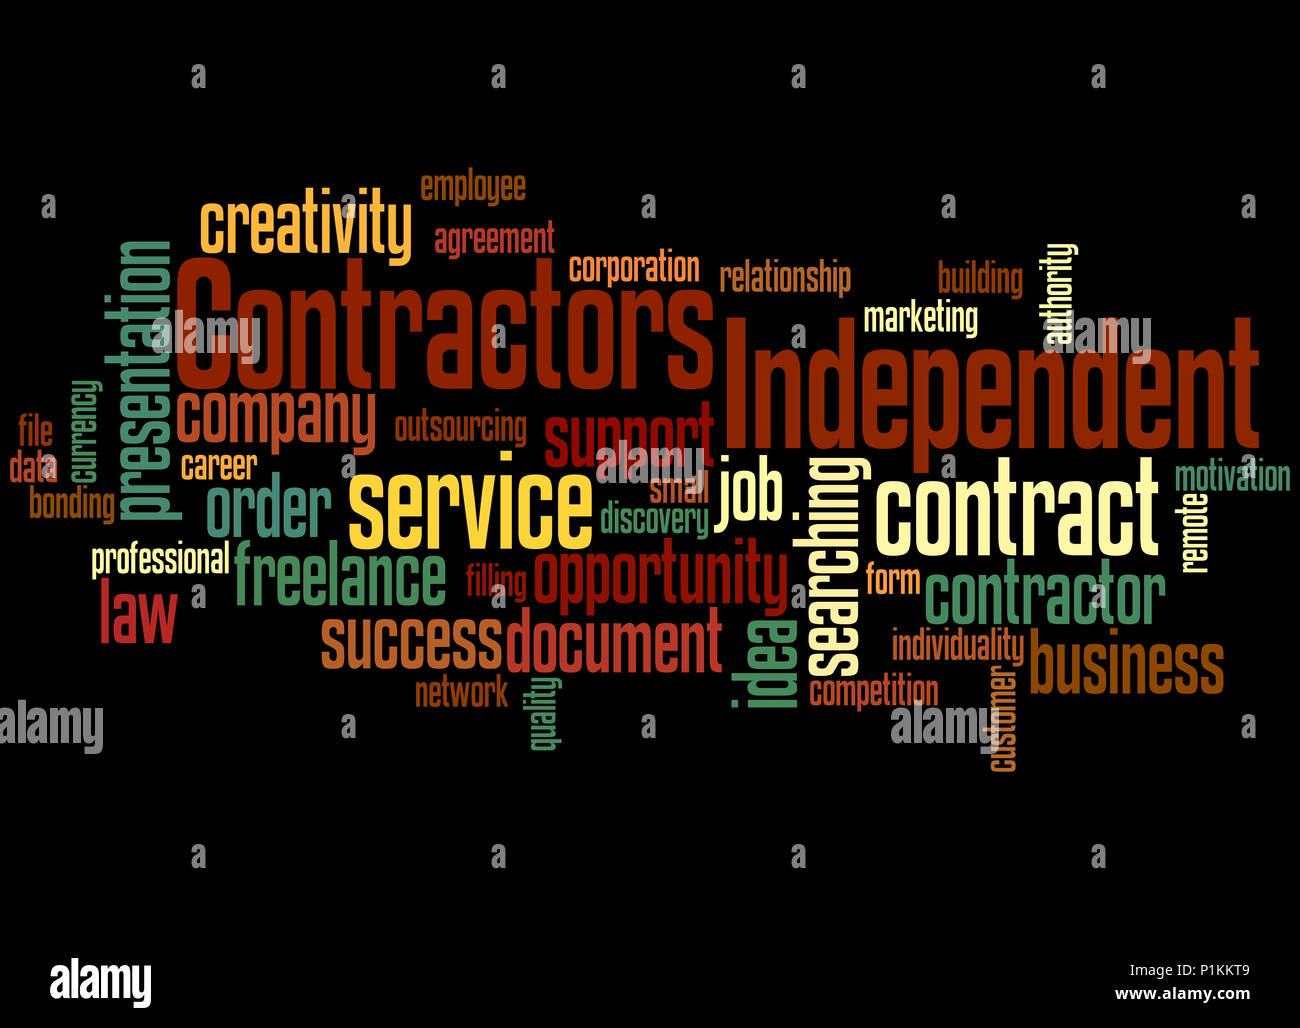 Independent contractors, word cloud concept on black